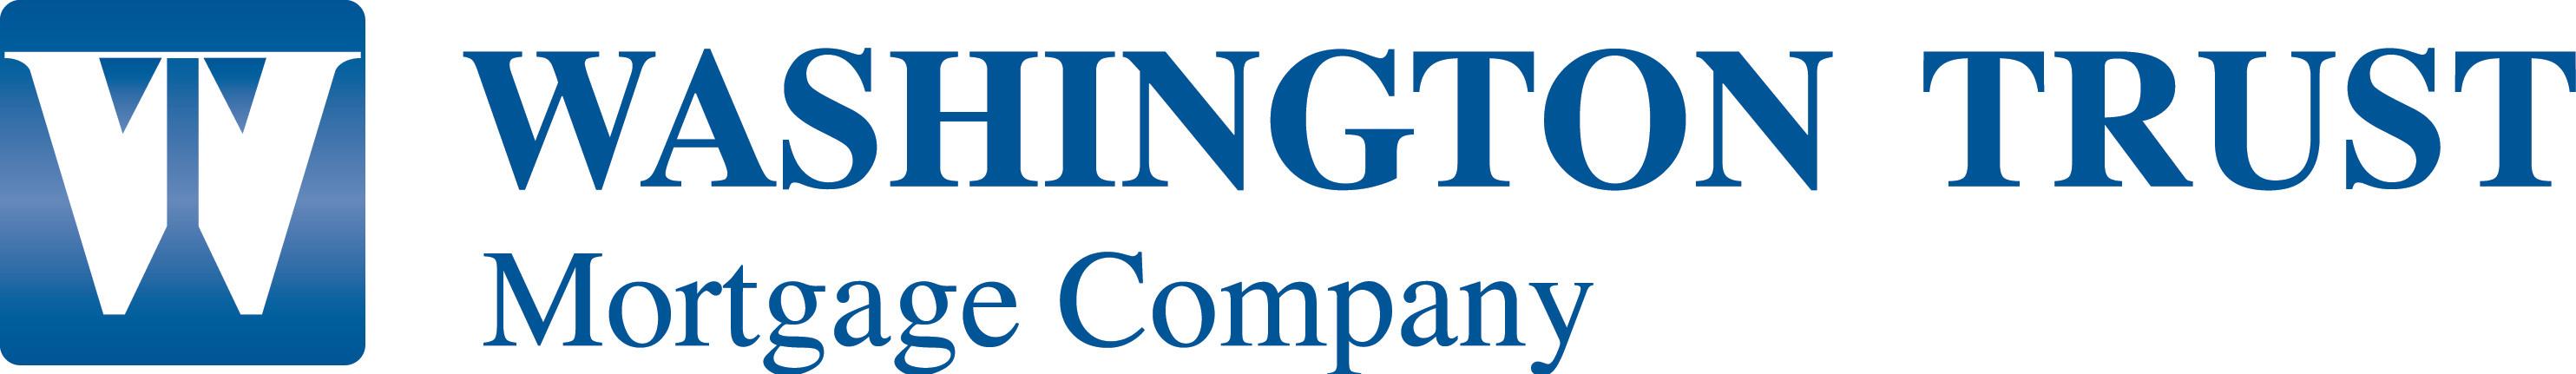 Washington Trust Mortgage Co.